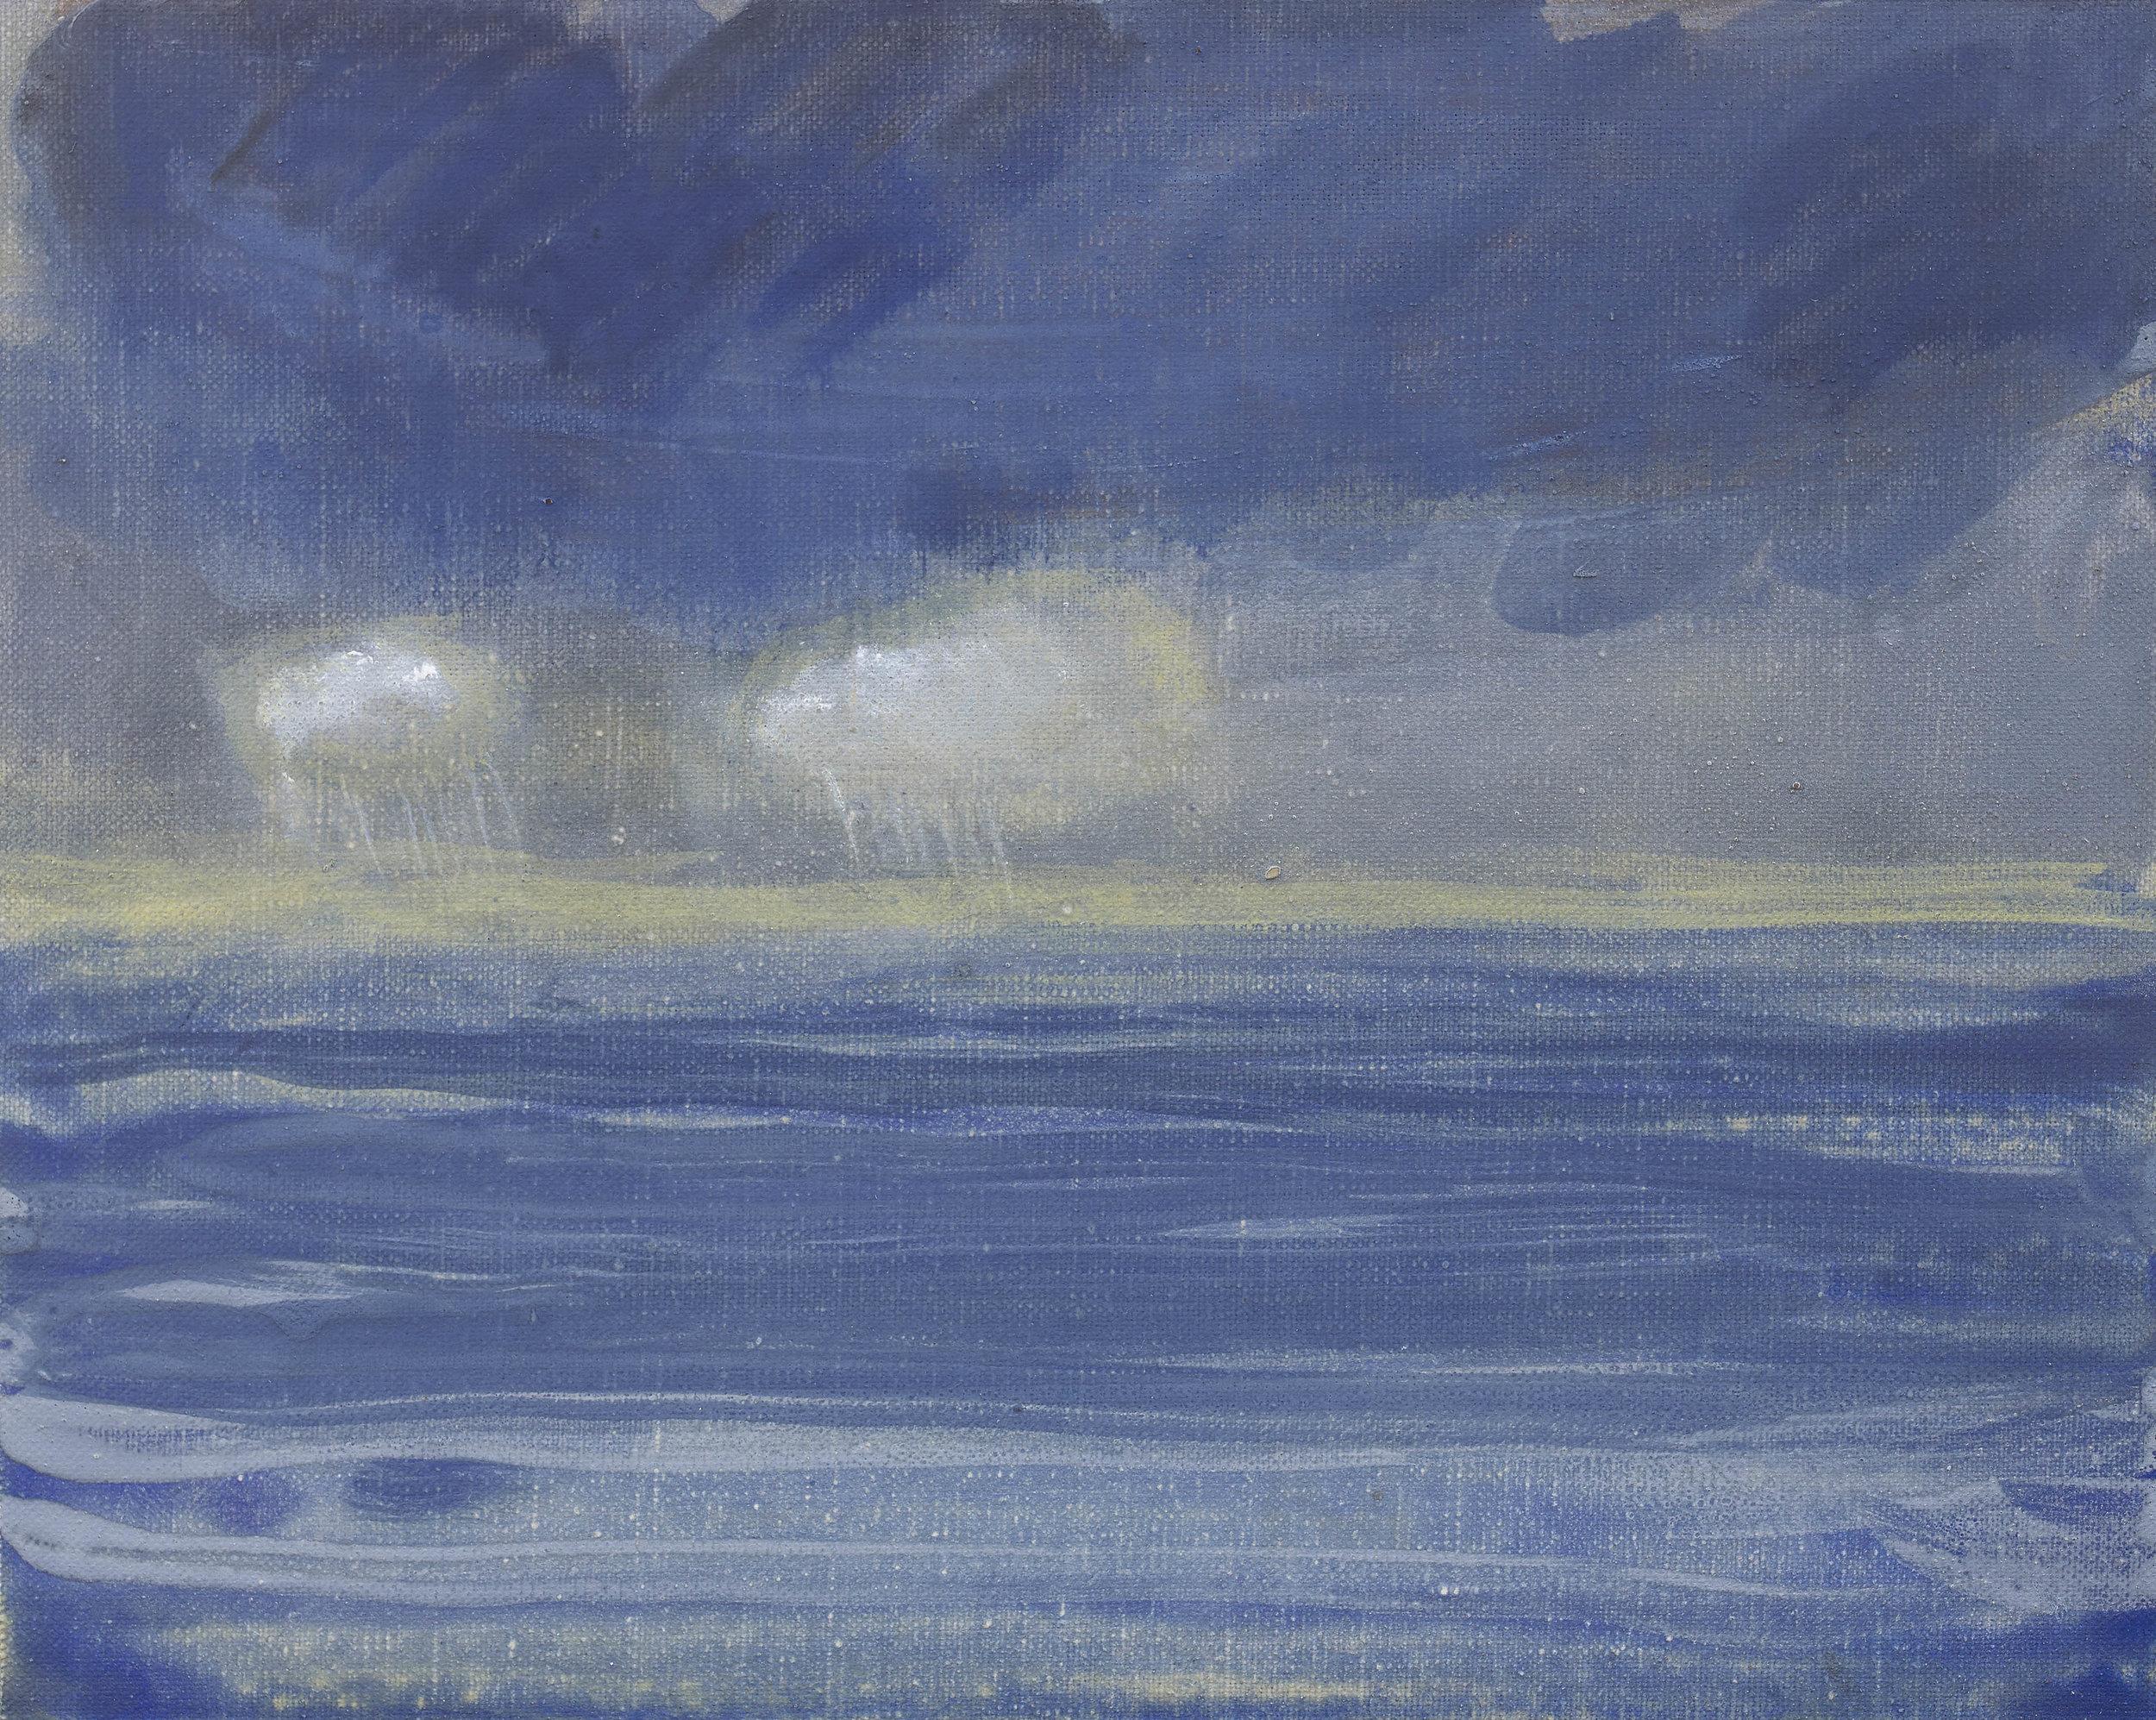 'Sea Rain' oil on linen 9½ x 11¾  ins 24 x 30 cms